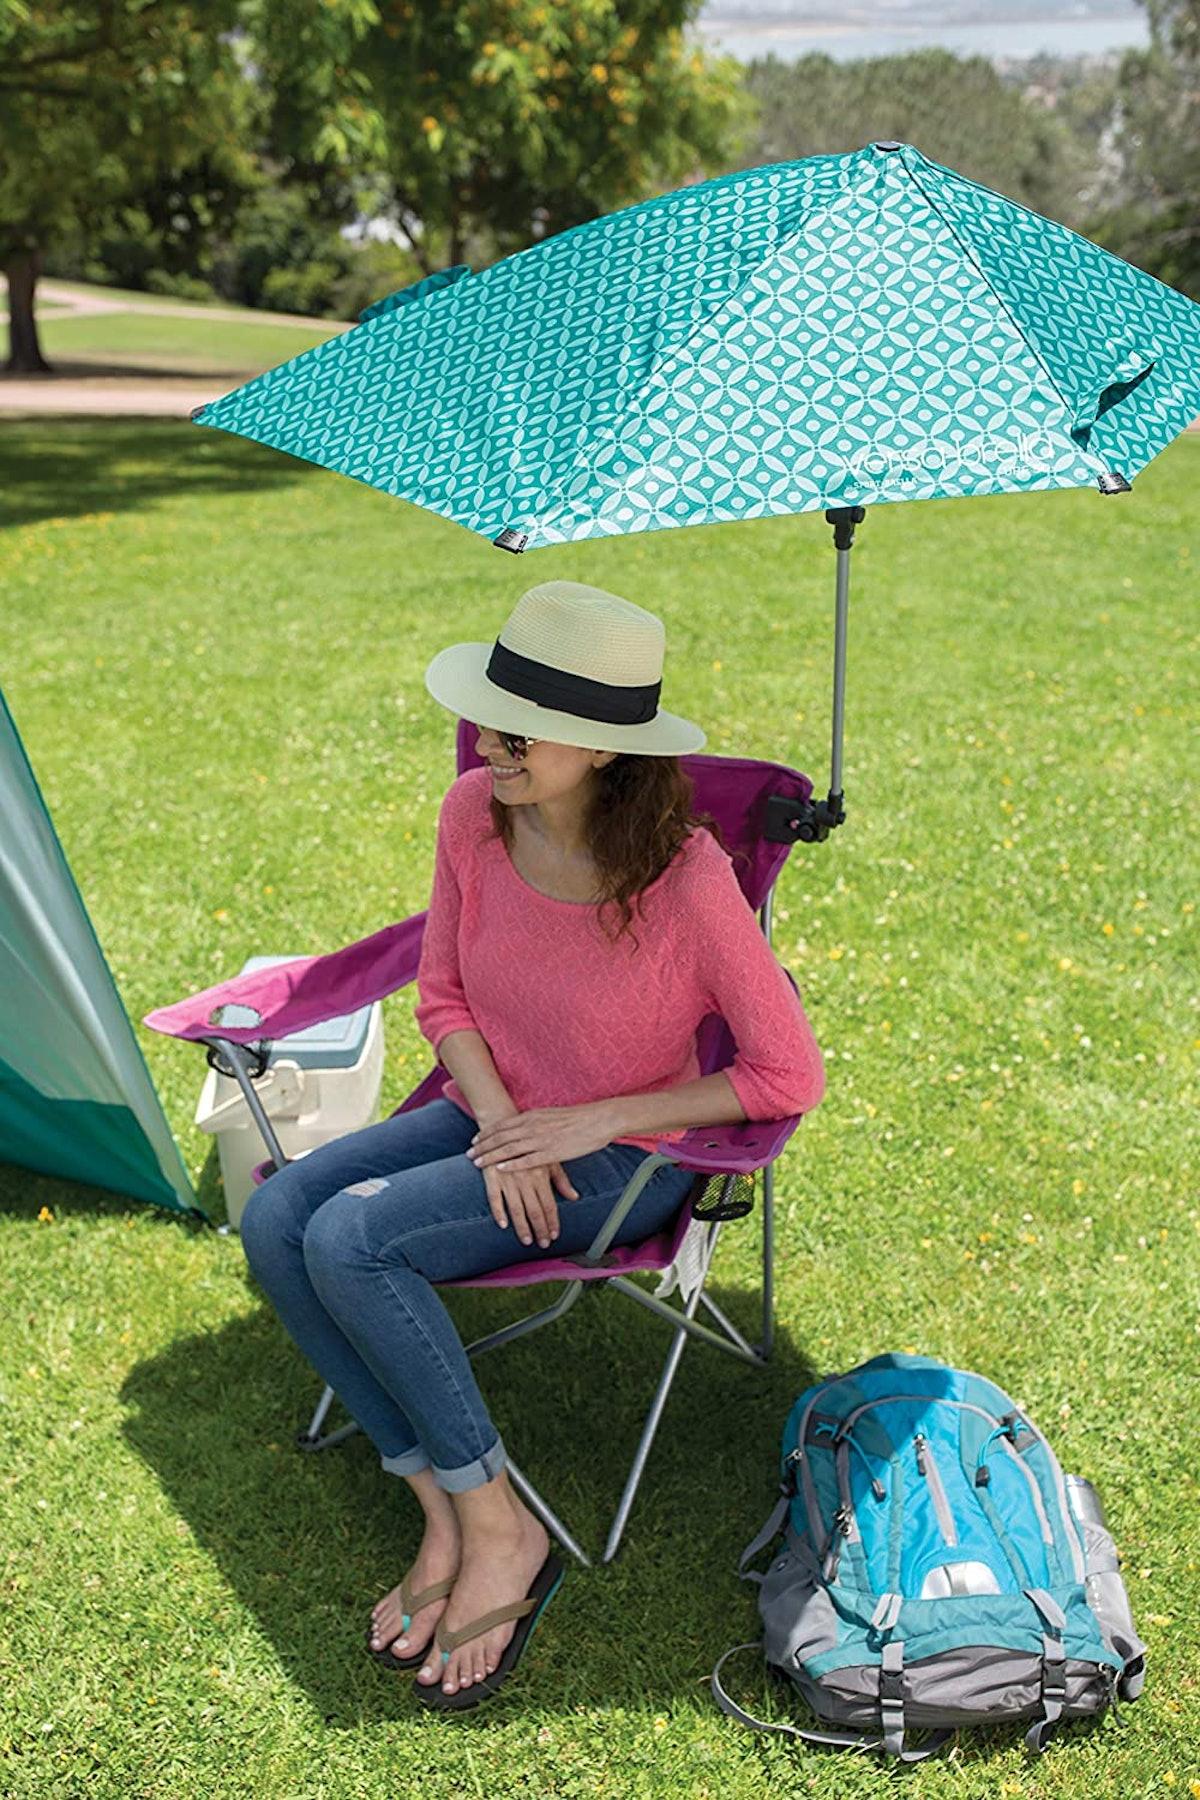 Sport-Brella Adjustable Umbrella With Universal Clamp